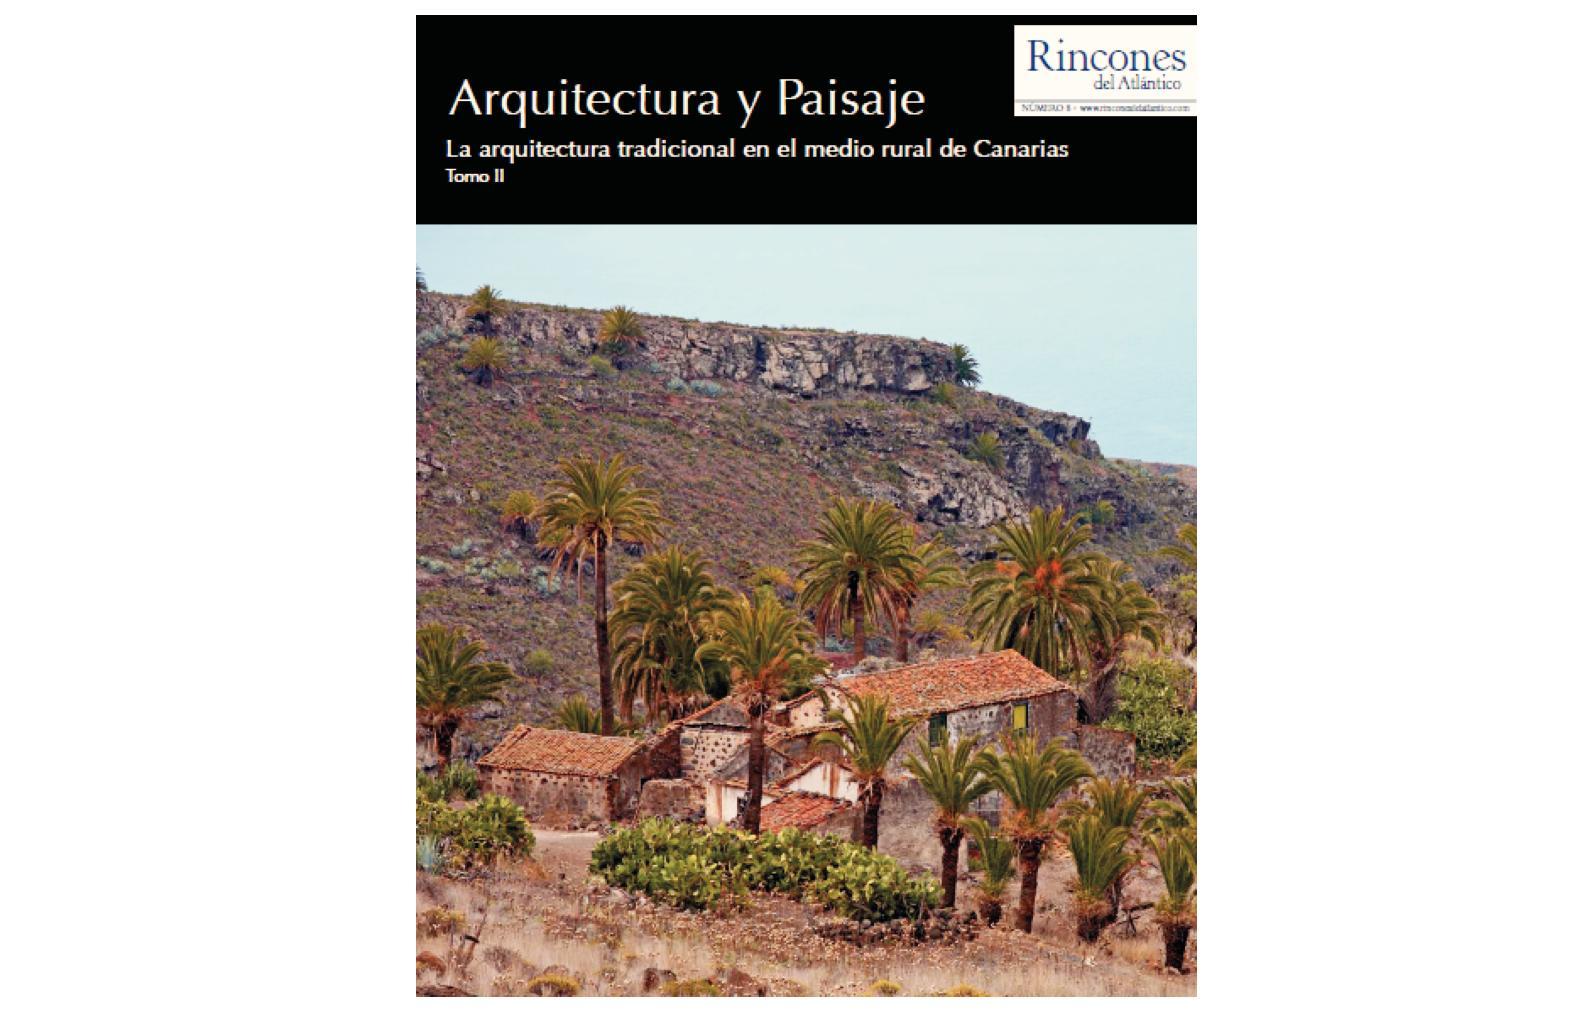 Calam O Arquitectura Y Paisaje La Arquitectura Tradicional En  # Muebles Naranjo Ingenio